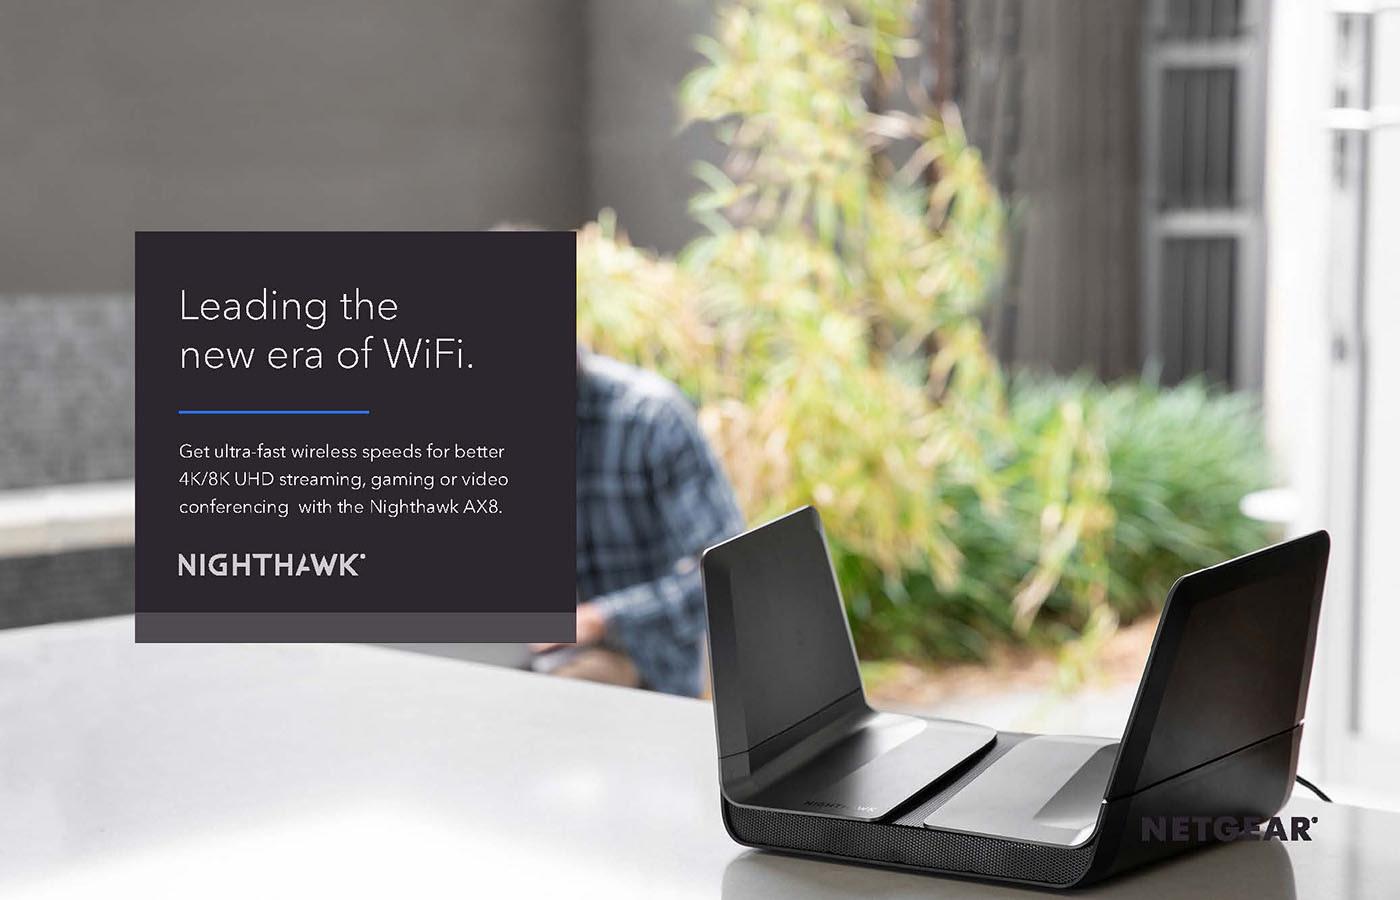 3D render of NETGEAR Nighthawk router in smart home